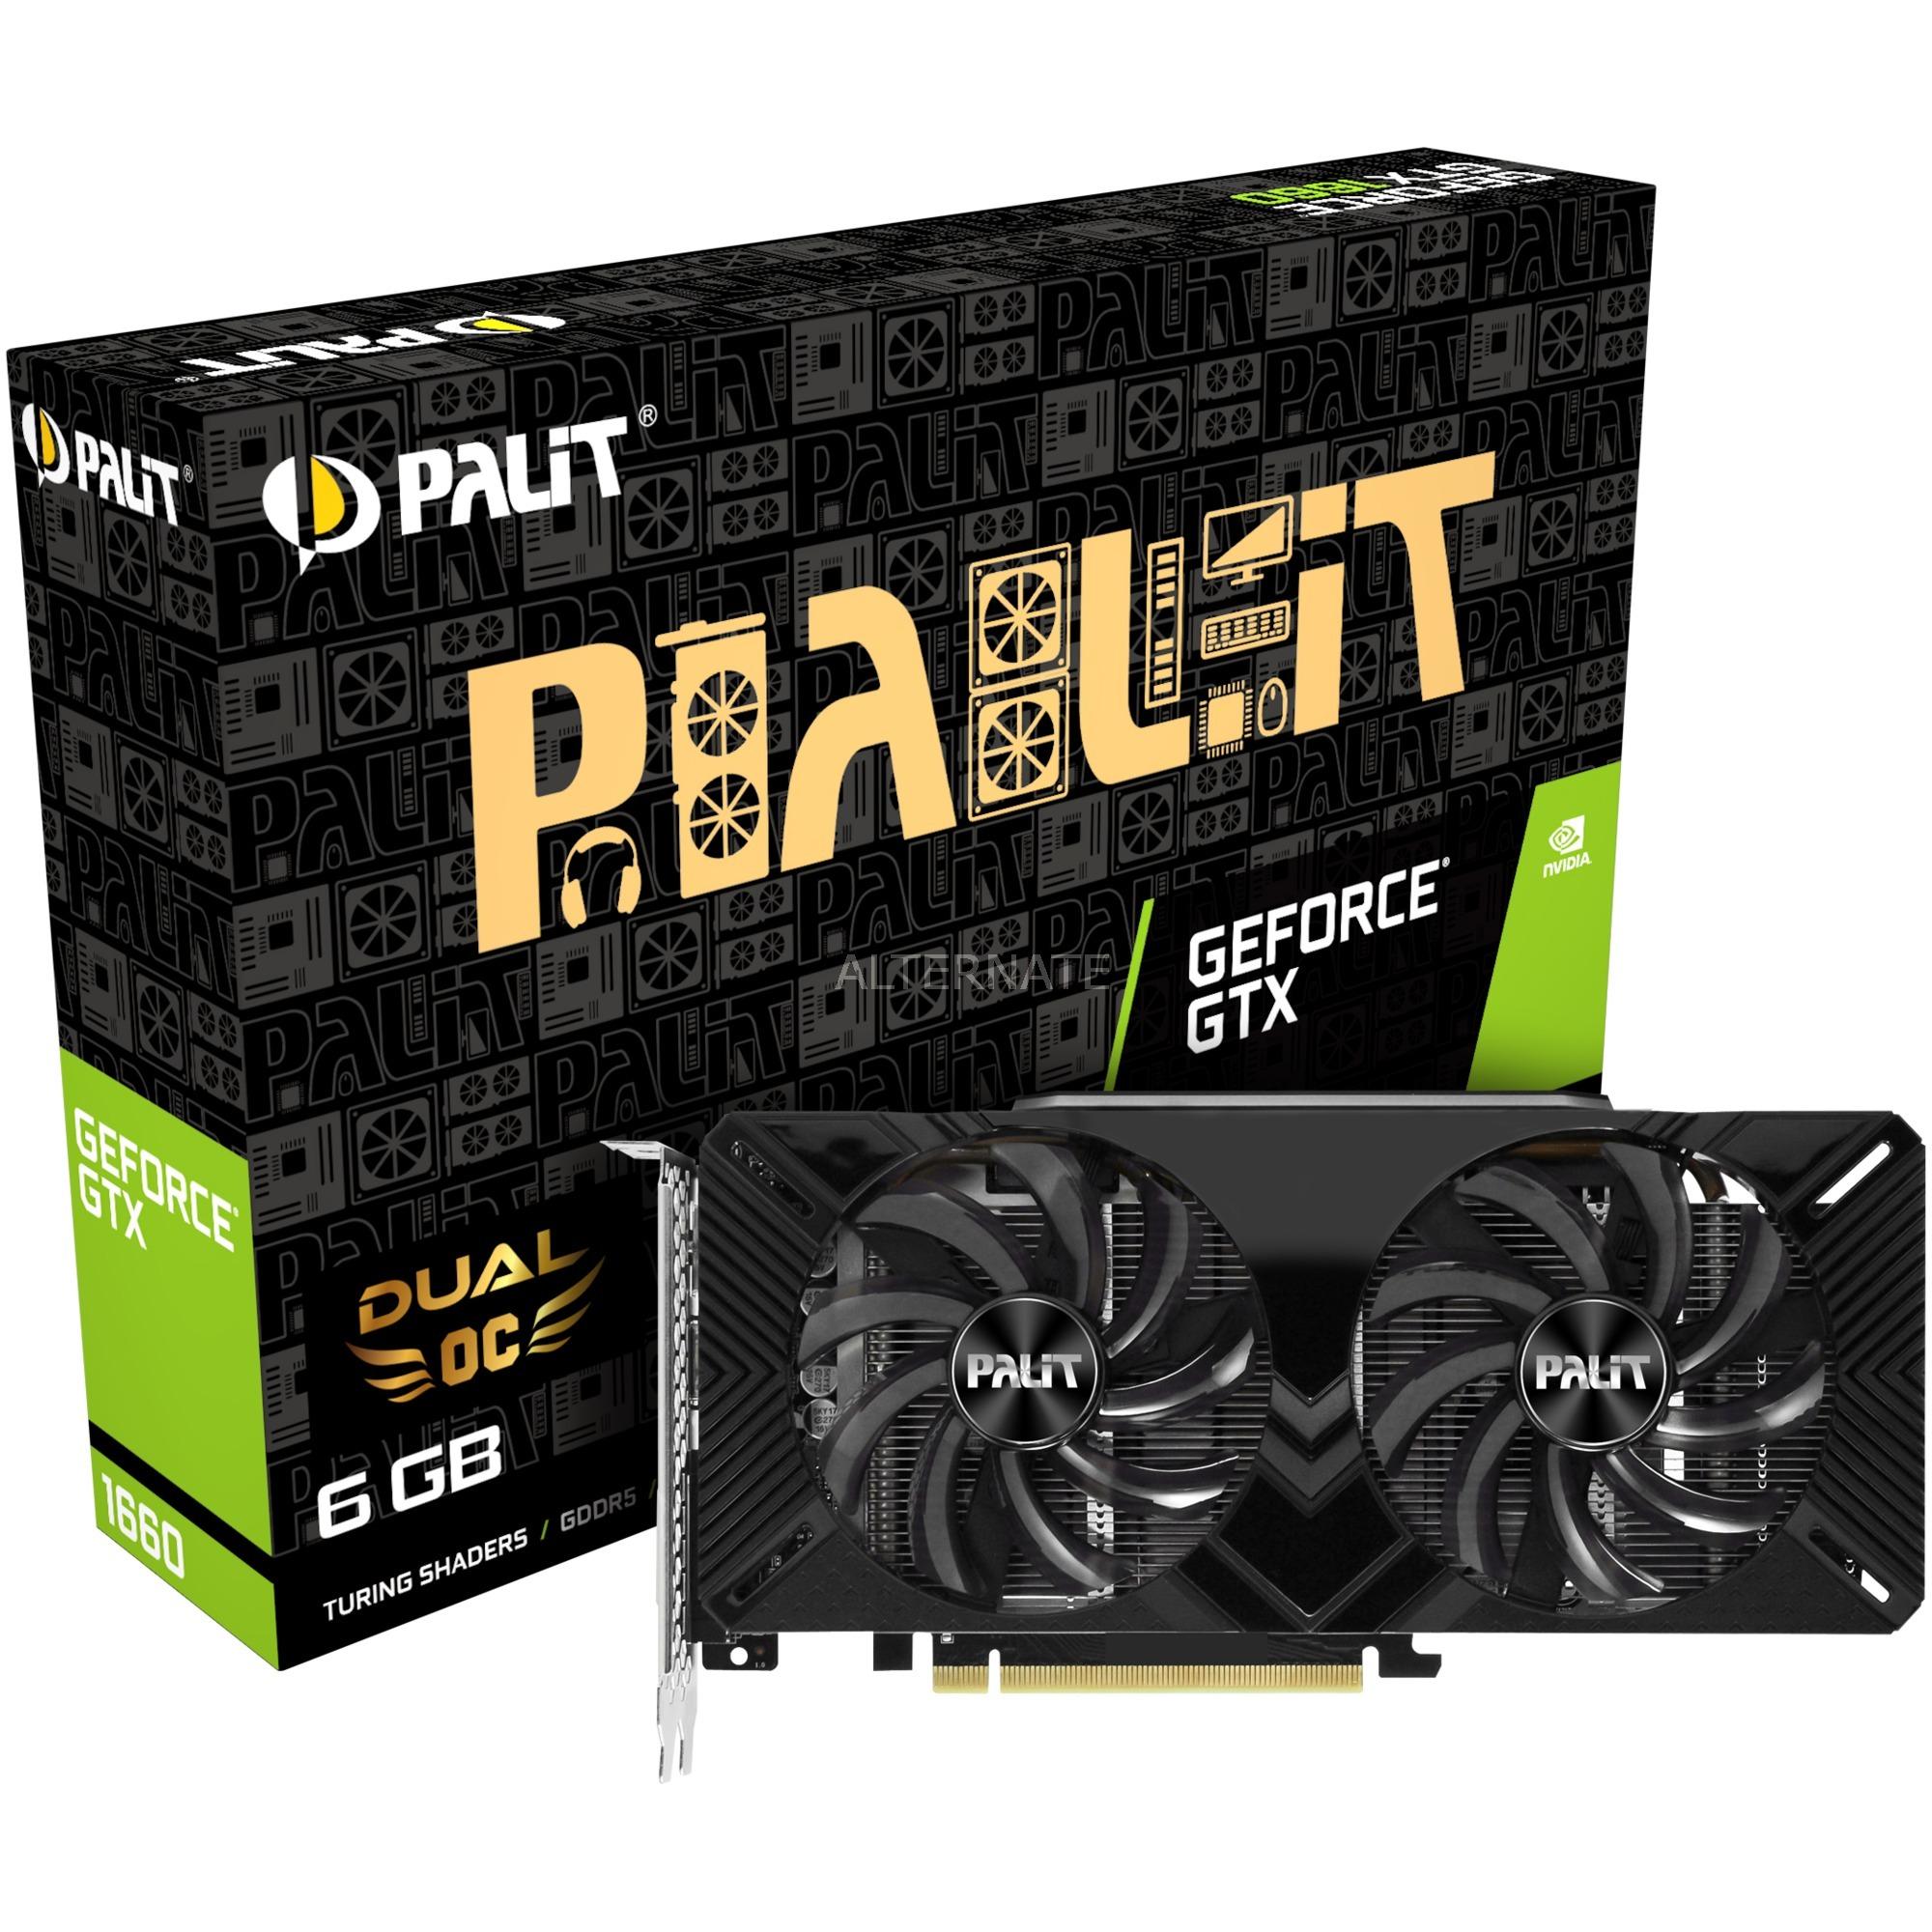 GeForce GTX 1660 Dual OC 6 GB GDDR5, Tarjeta gráfica